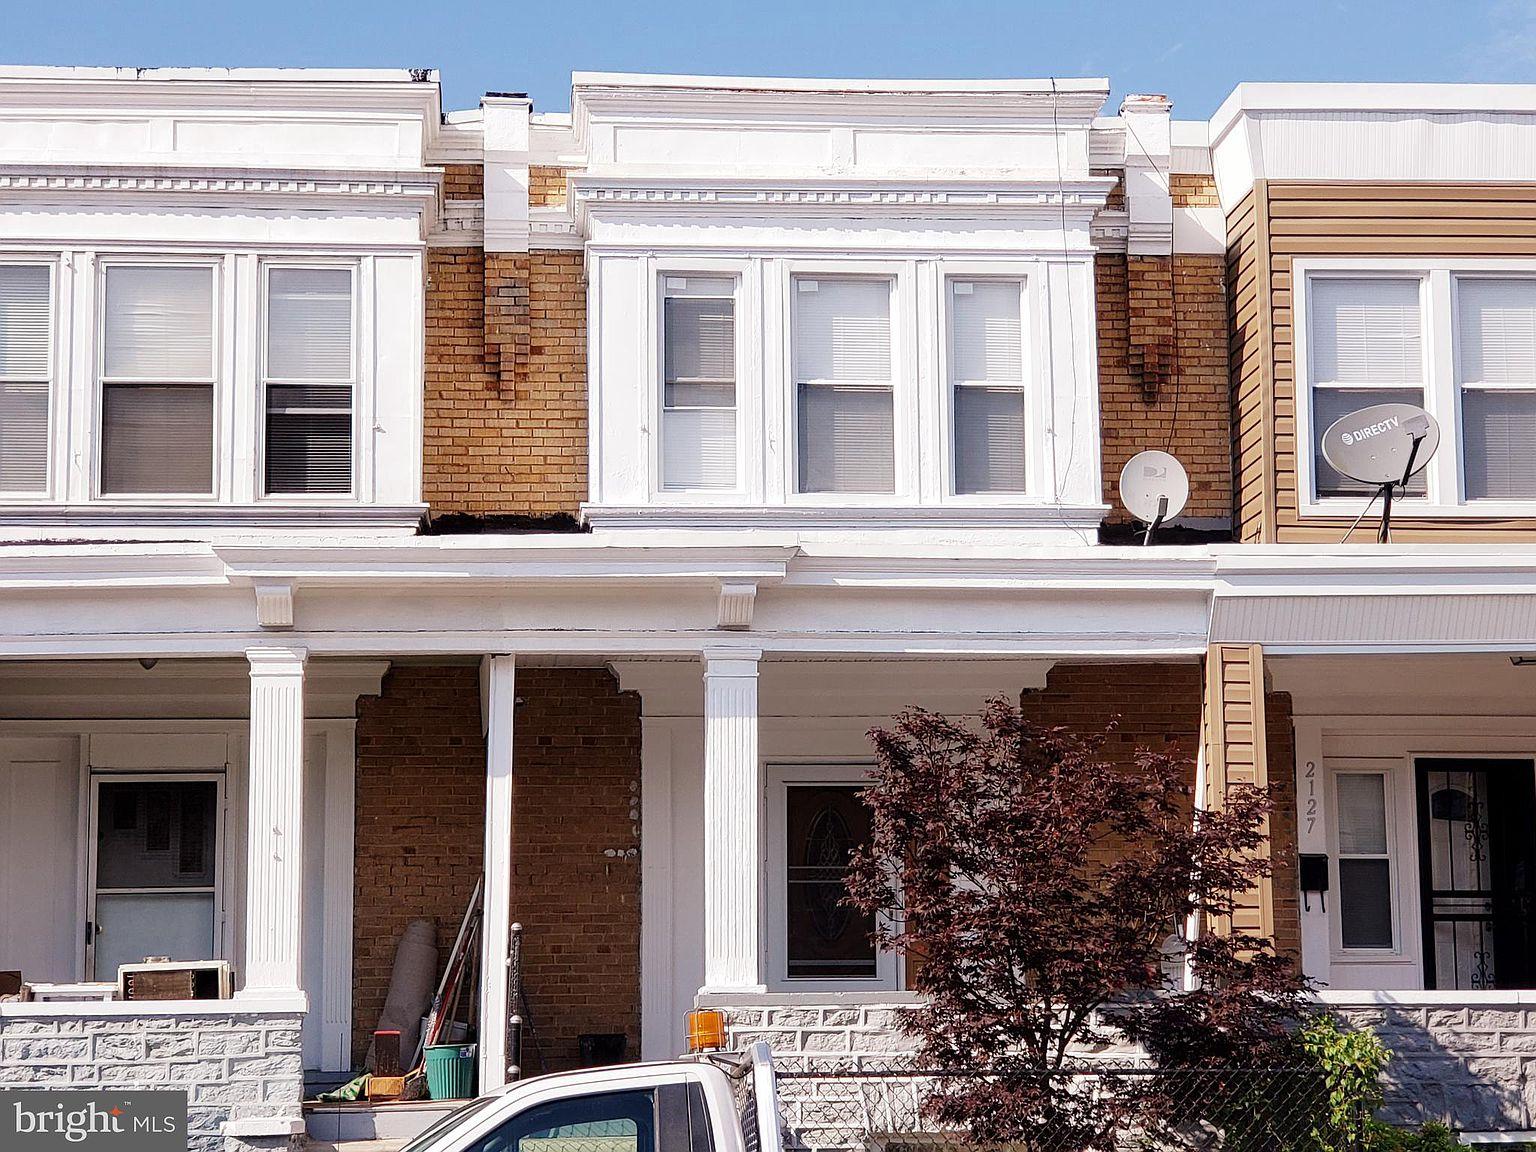 2129 Stenton Ave, Philadelphia, PA 19138   MLS #PAPH906924   Zillow